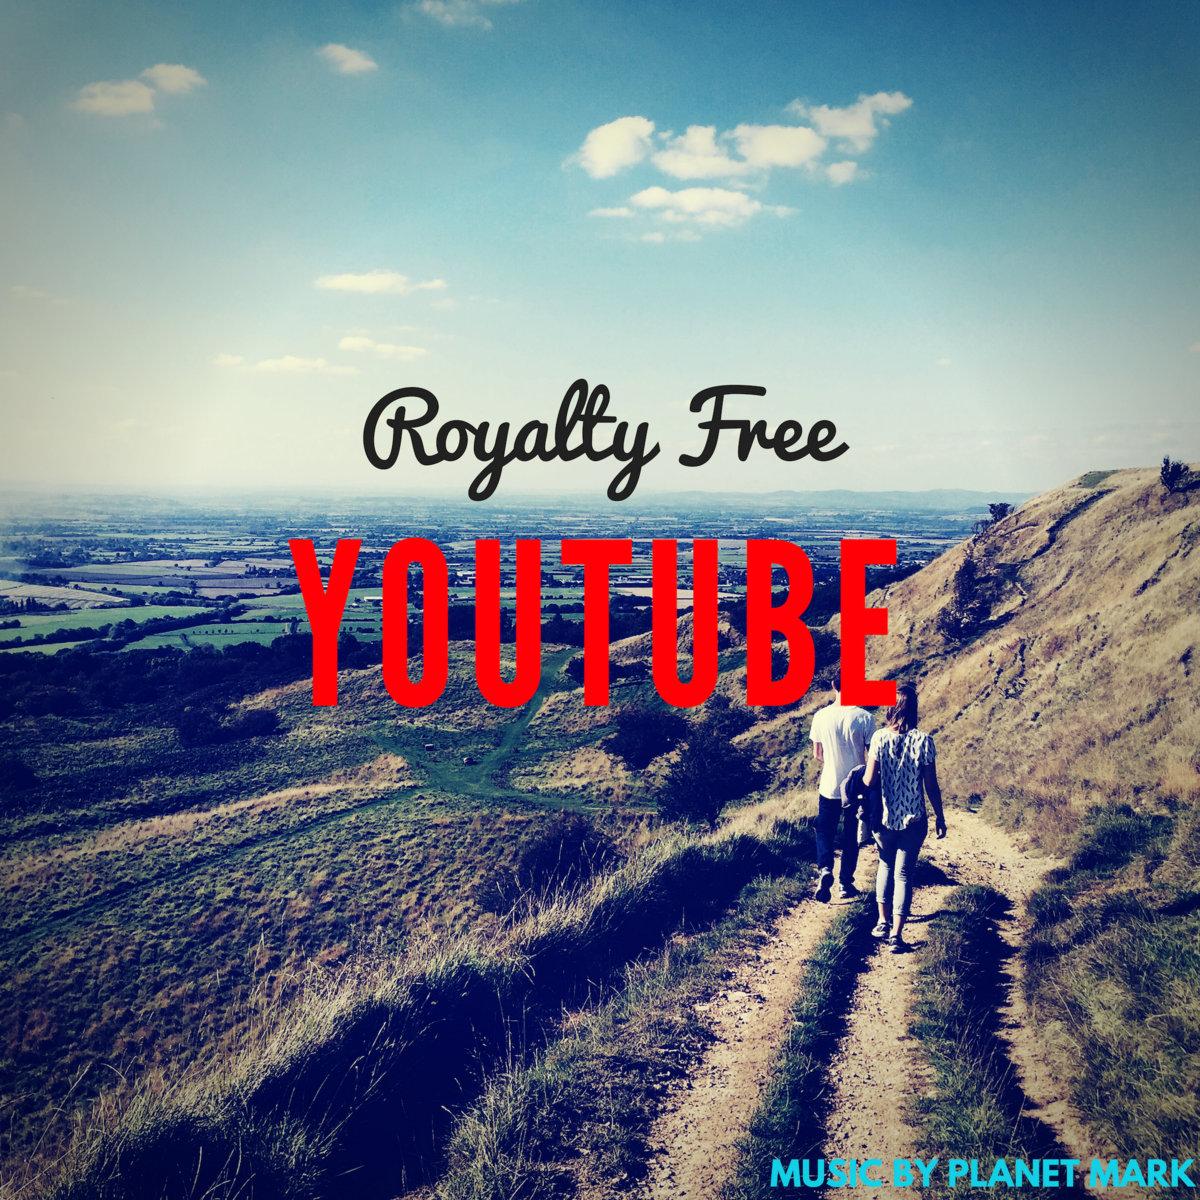 Youtube Royalty FREE background music | Mark Phillpot